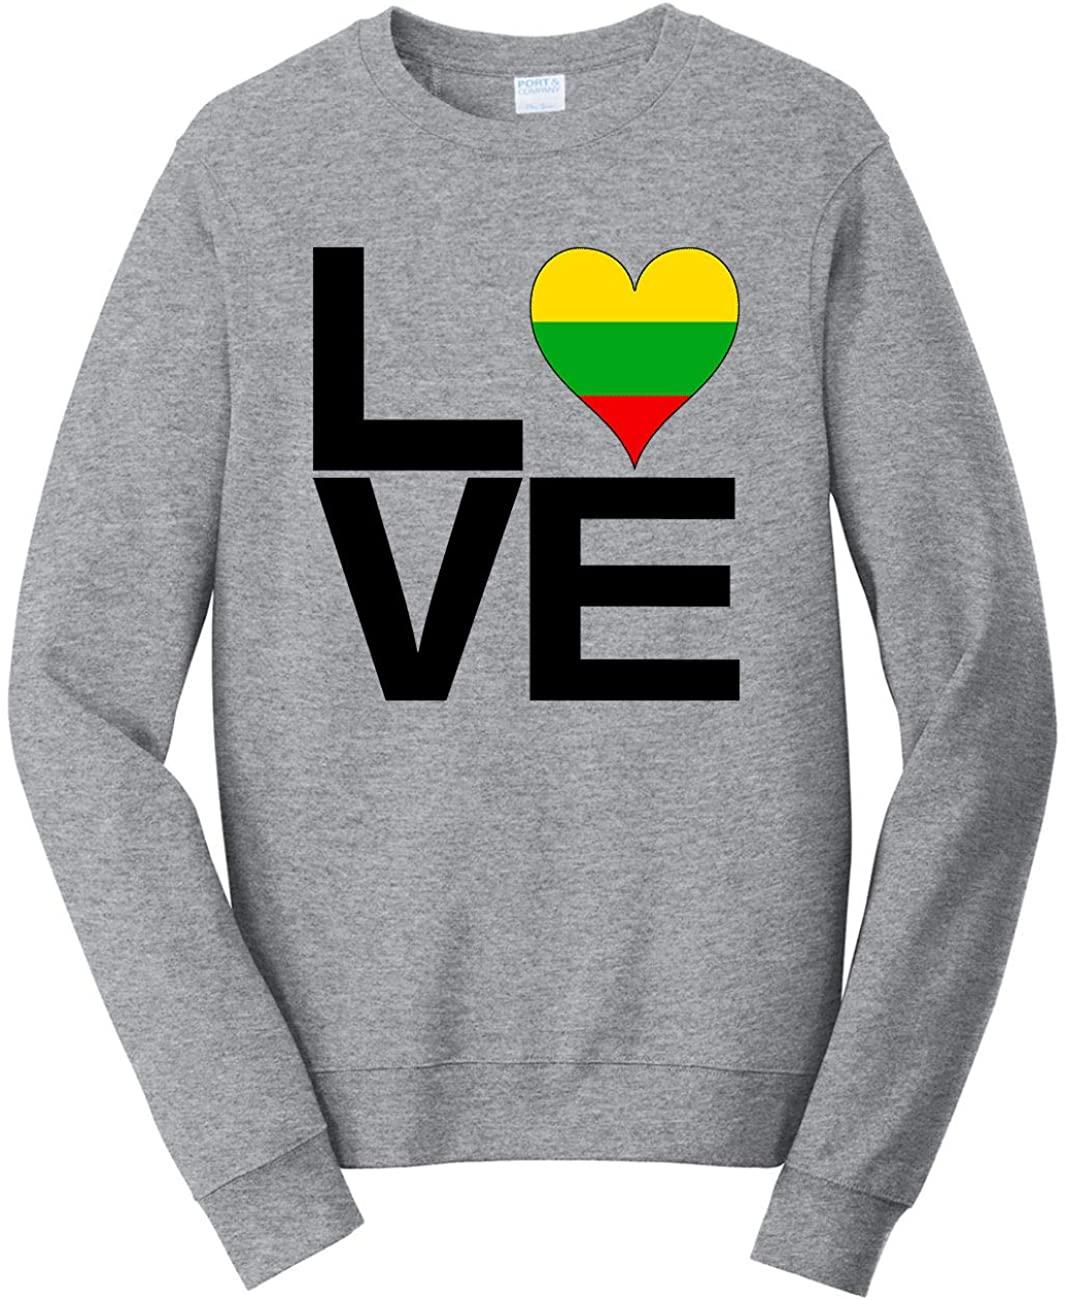 HARD EDGE DESIGN Unisex Love Block Lithuania Heart Sweatshirt, 4X-Large, Heather Grey